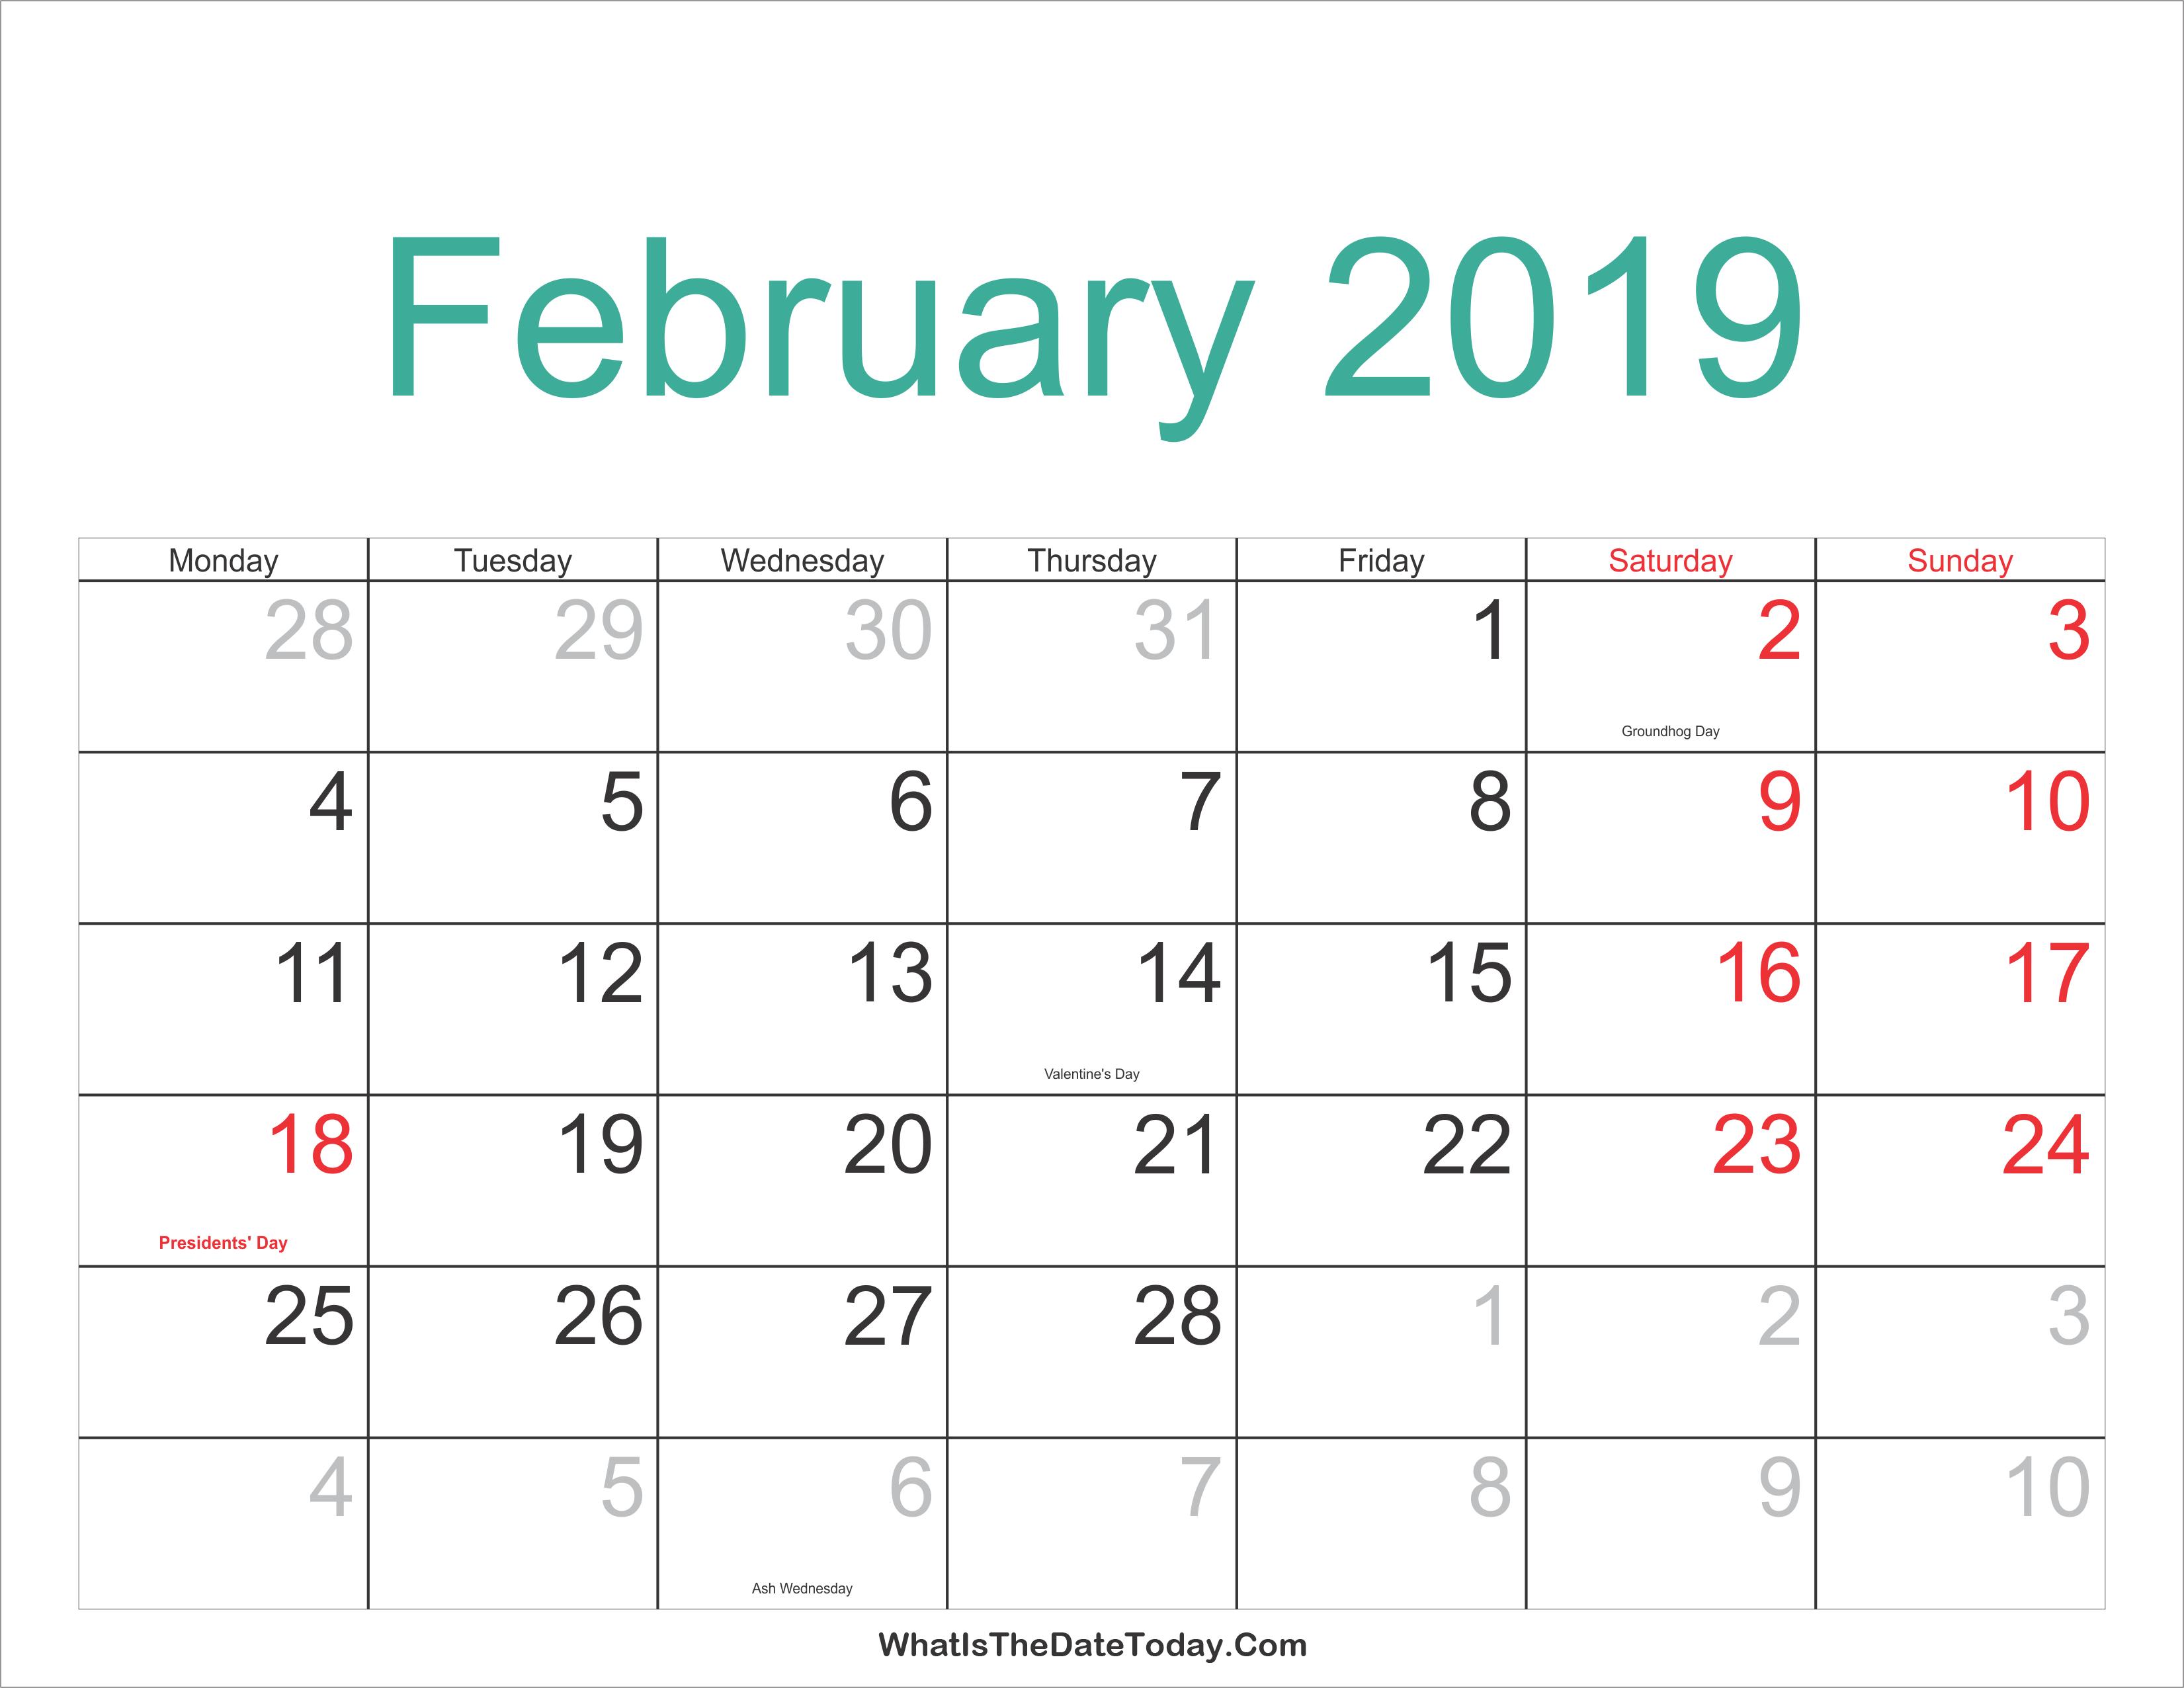 Feb 2019 Calendar Holidays - Free Printable Calendar Templates Blank Feb 7 2019 Calendar